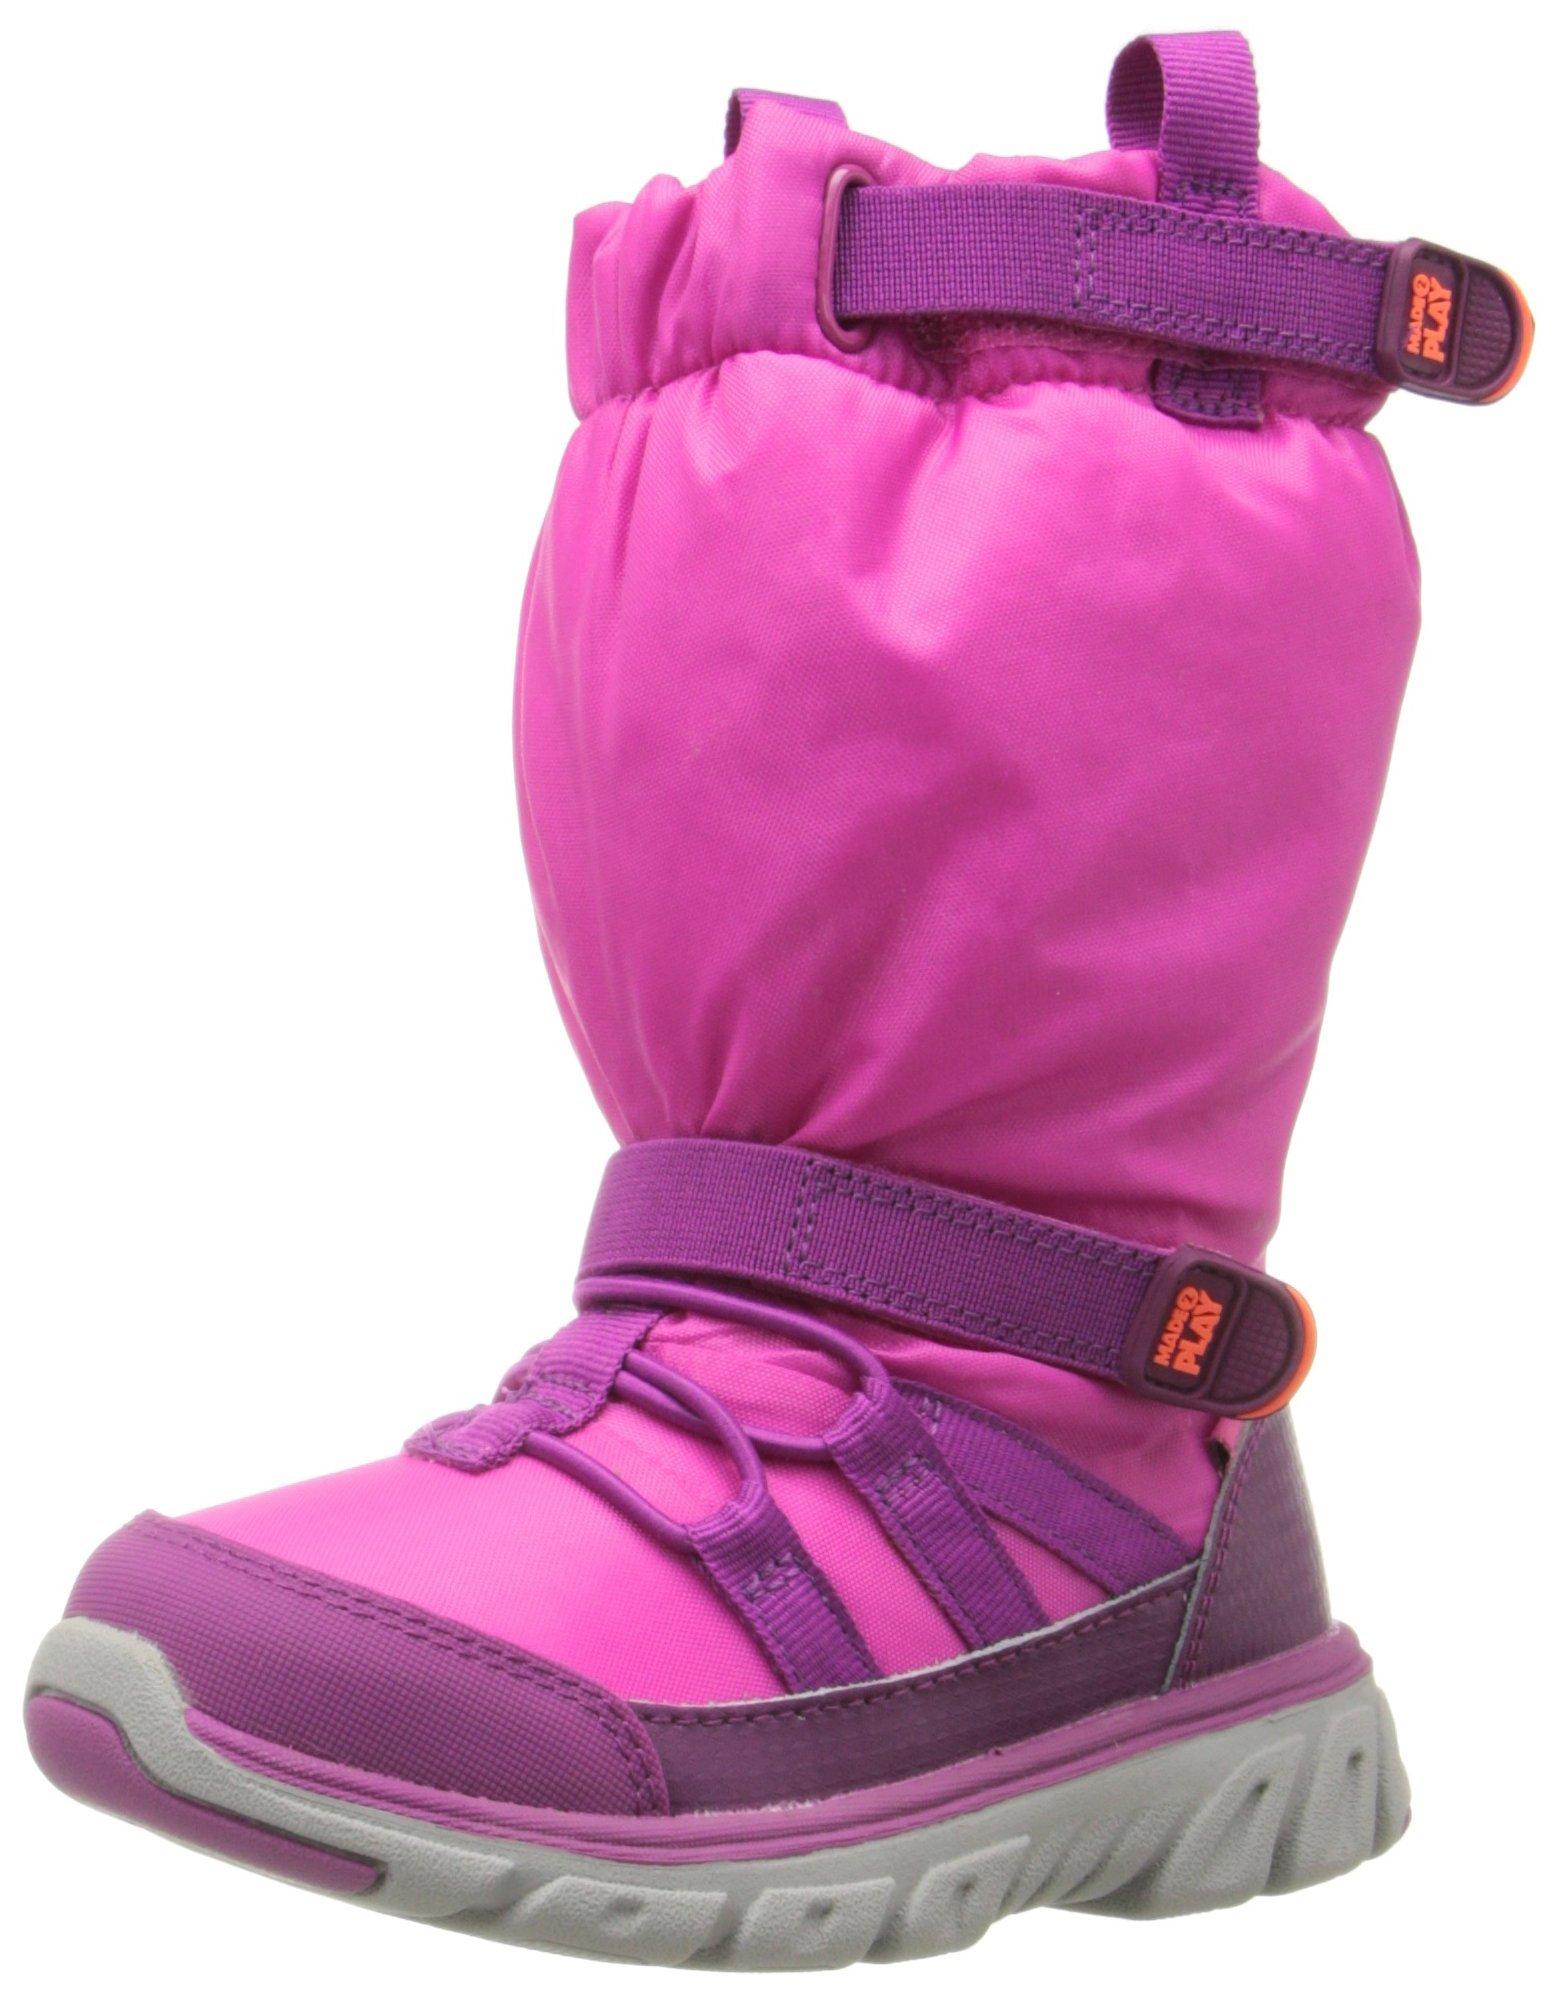 Stride Rite Made 2 Play Sneaker Winter Boot (Toddler/Little Kid), Pink, 9 M US Toddler